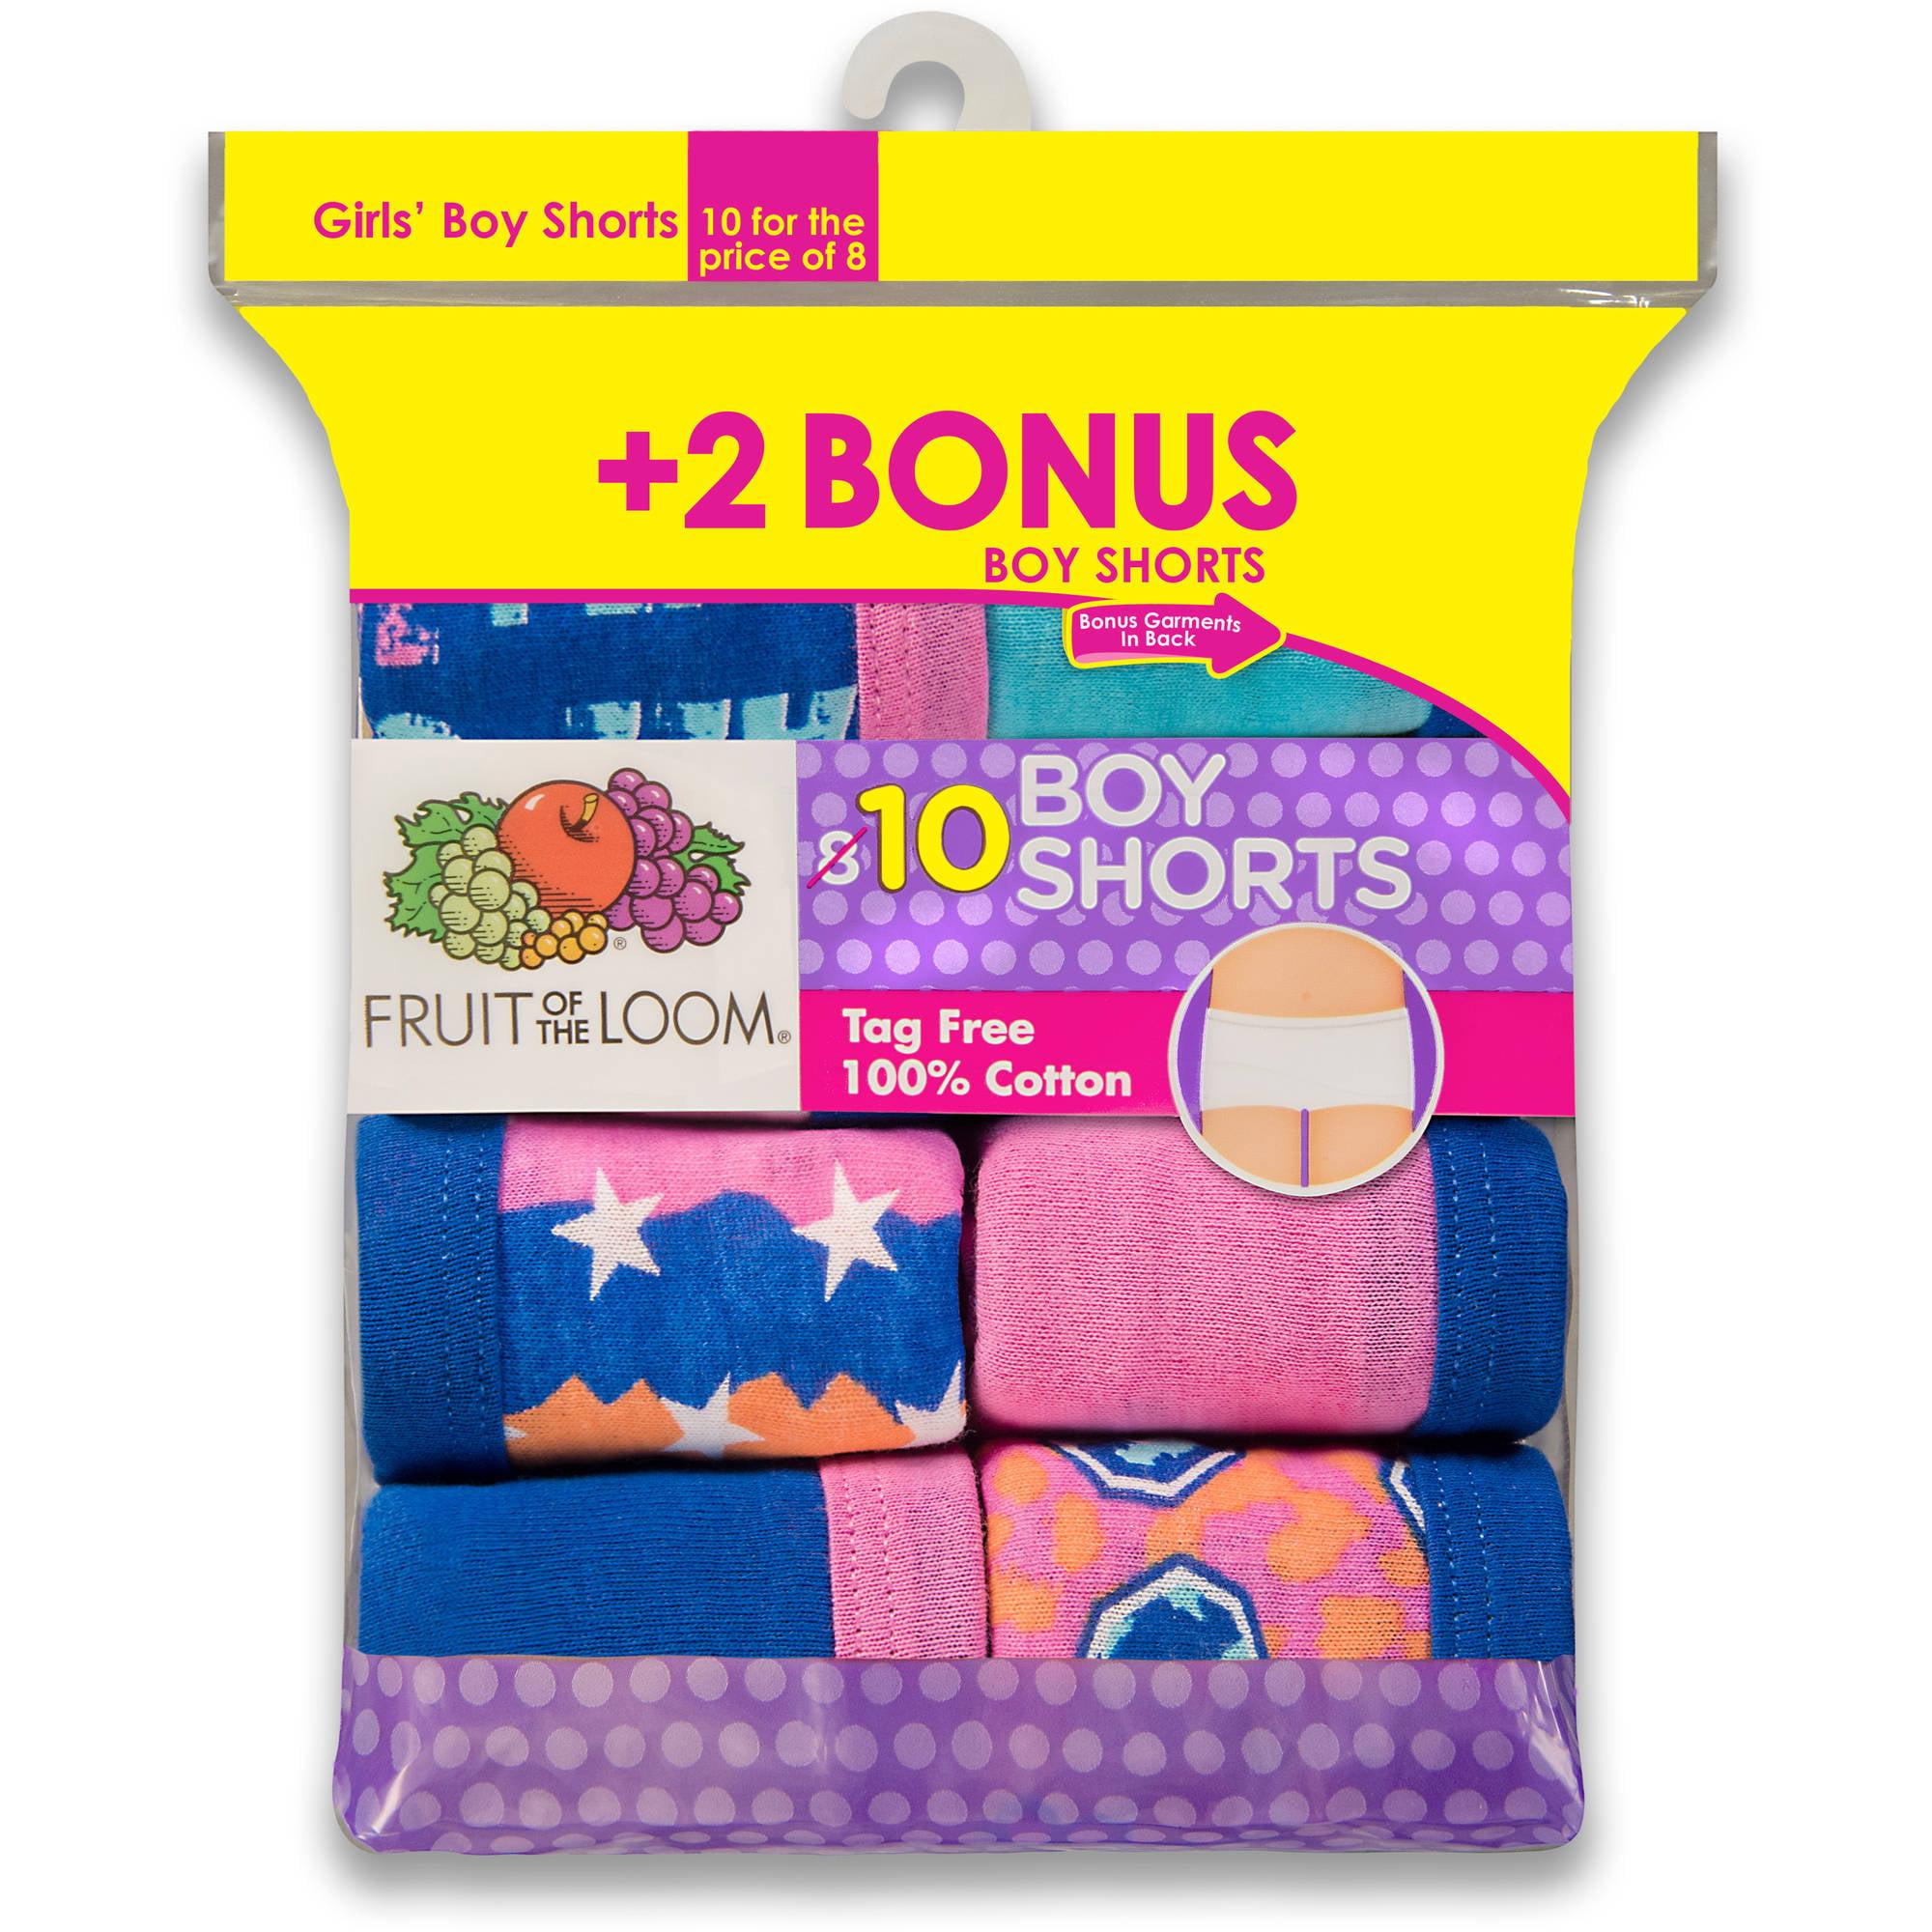 Fruit of the Loom Girls' 100% Cotton Boy Short Panty, 8+2 Bonus Pack